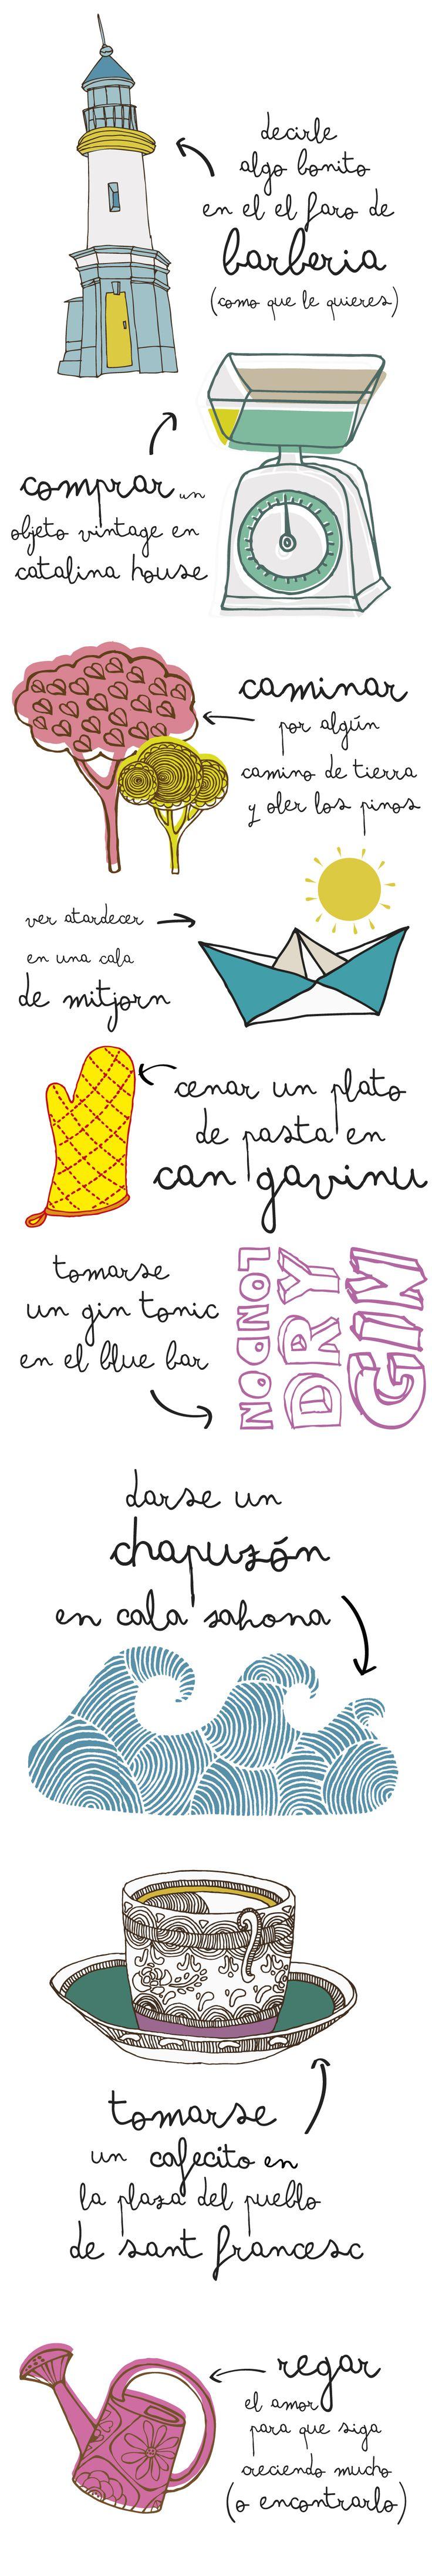 Guia_formentera_3